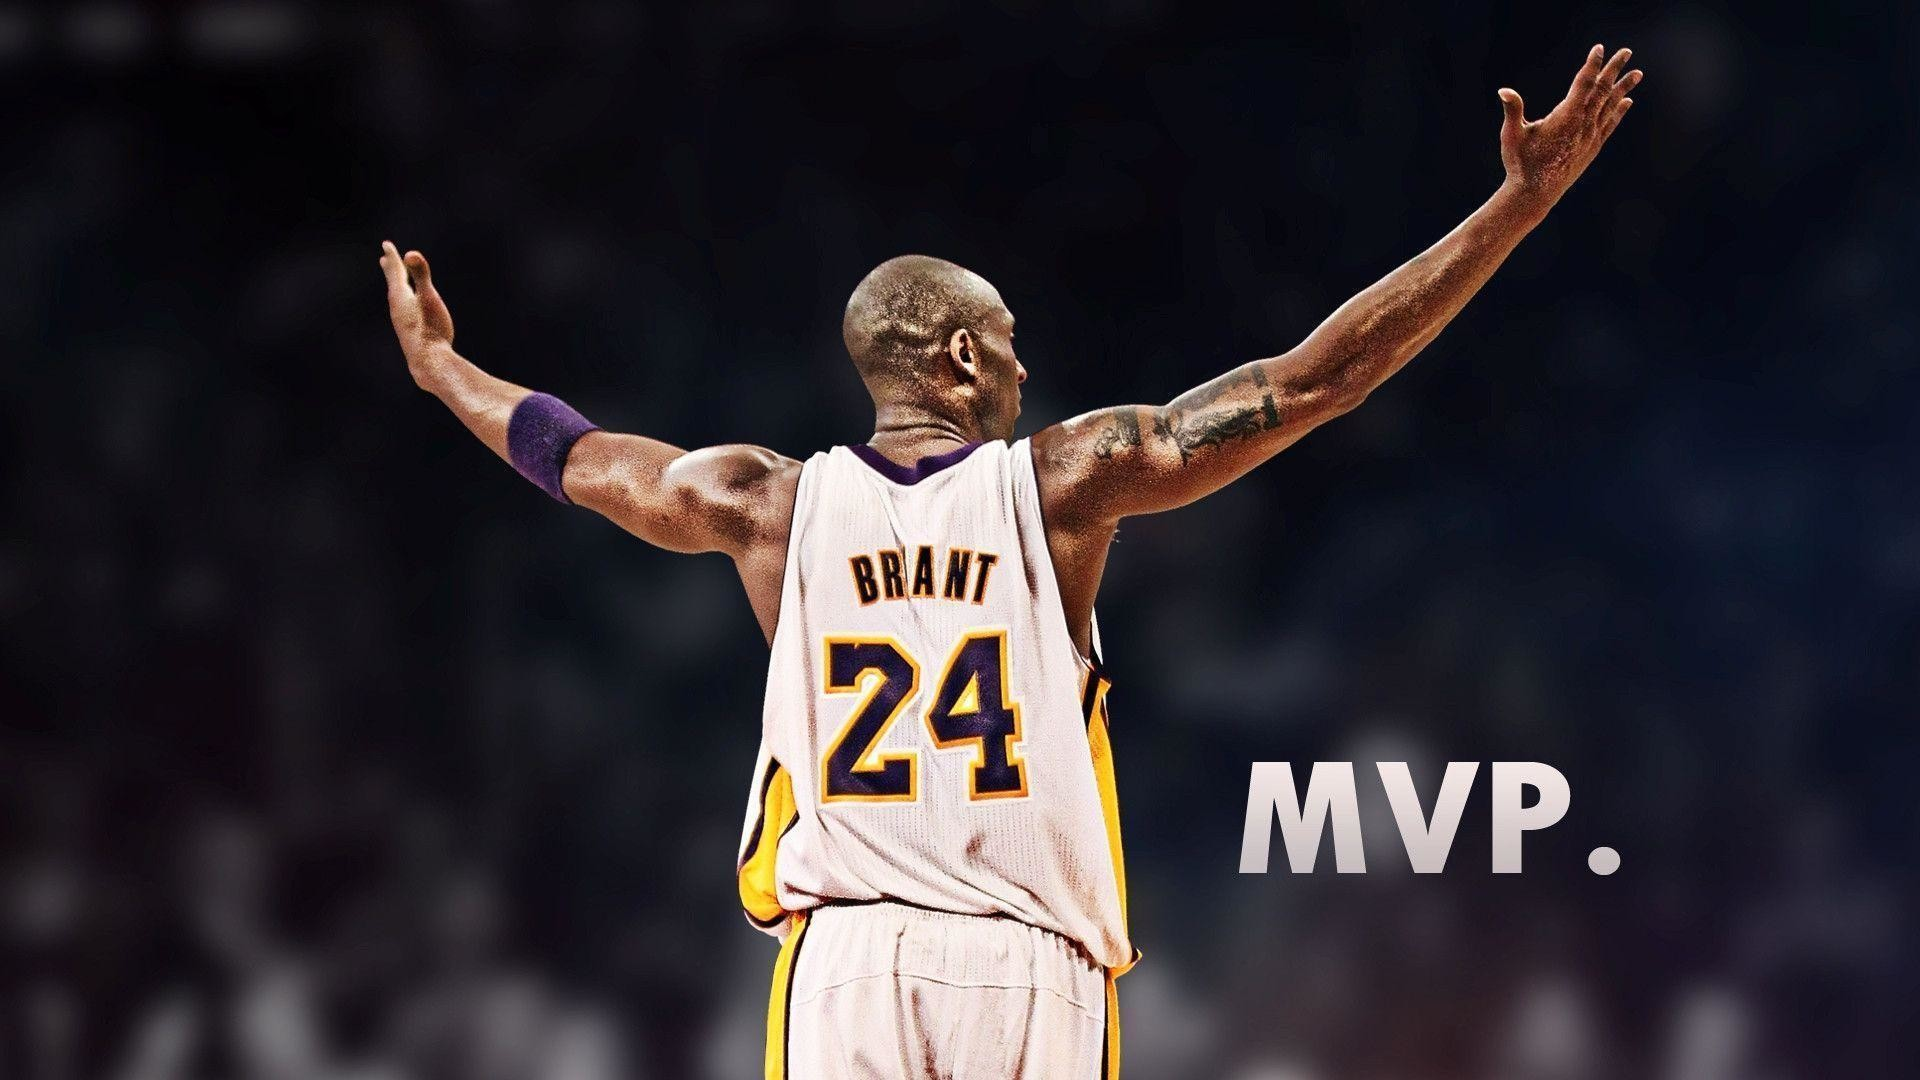 Kobe Bryant 24 Wallpaper 77 Images